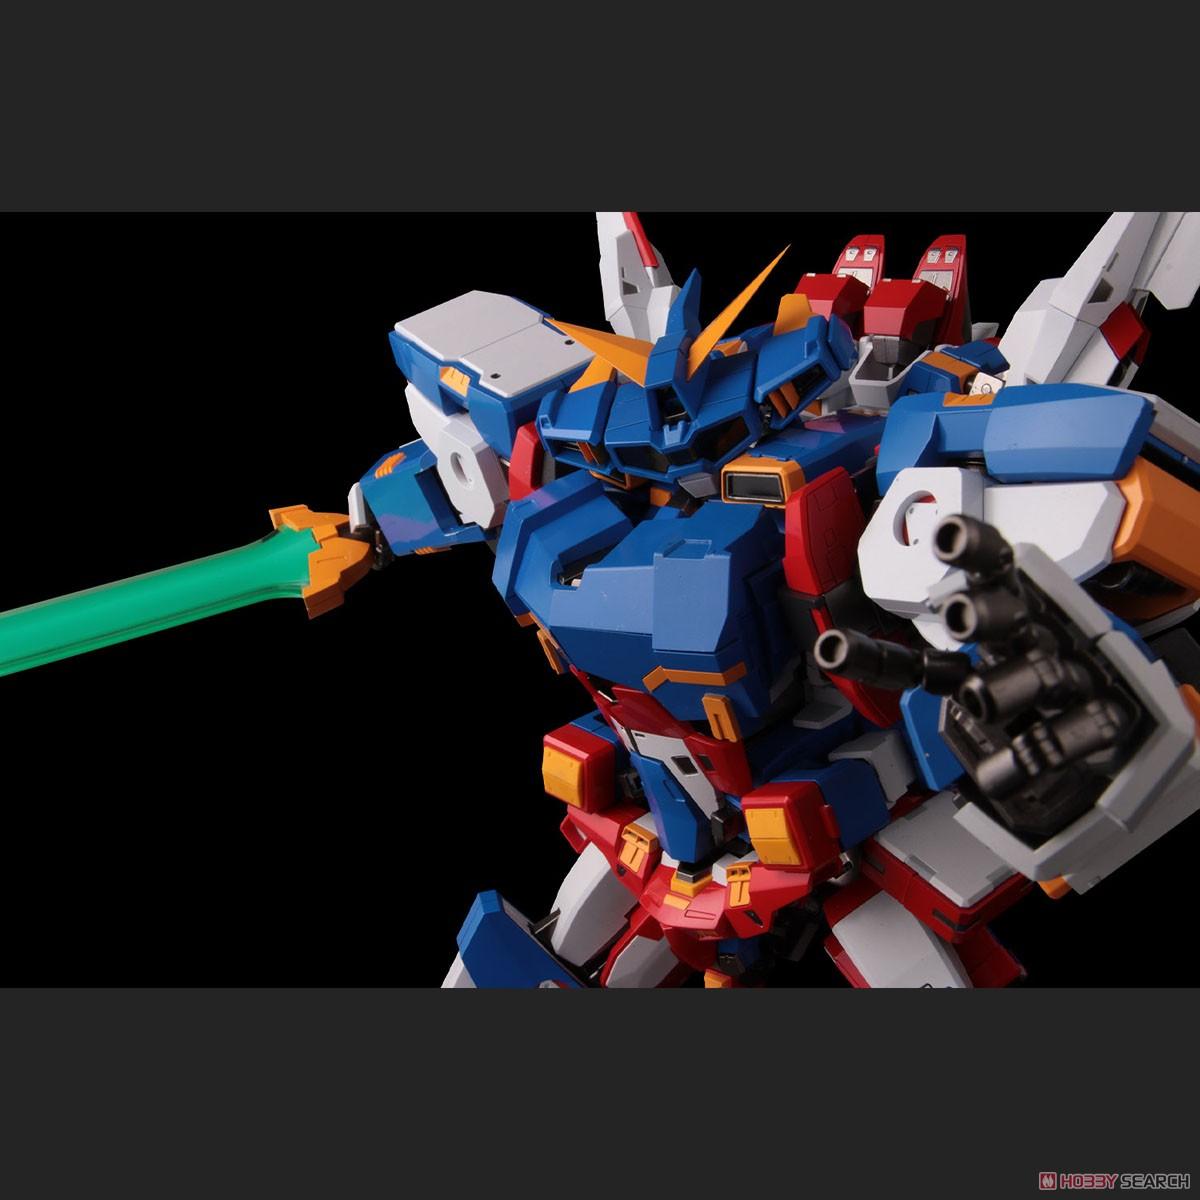 RIOBOT『変形合体 R-1』スーパーロボット大戦OG 可変合体フィギュア-051